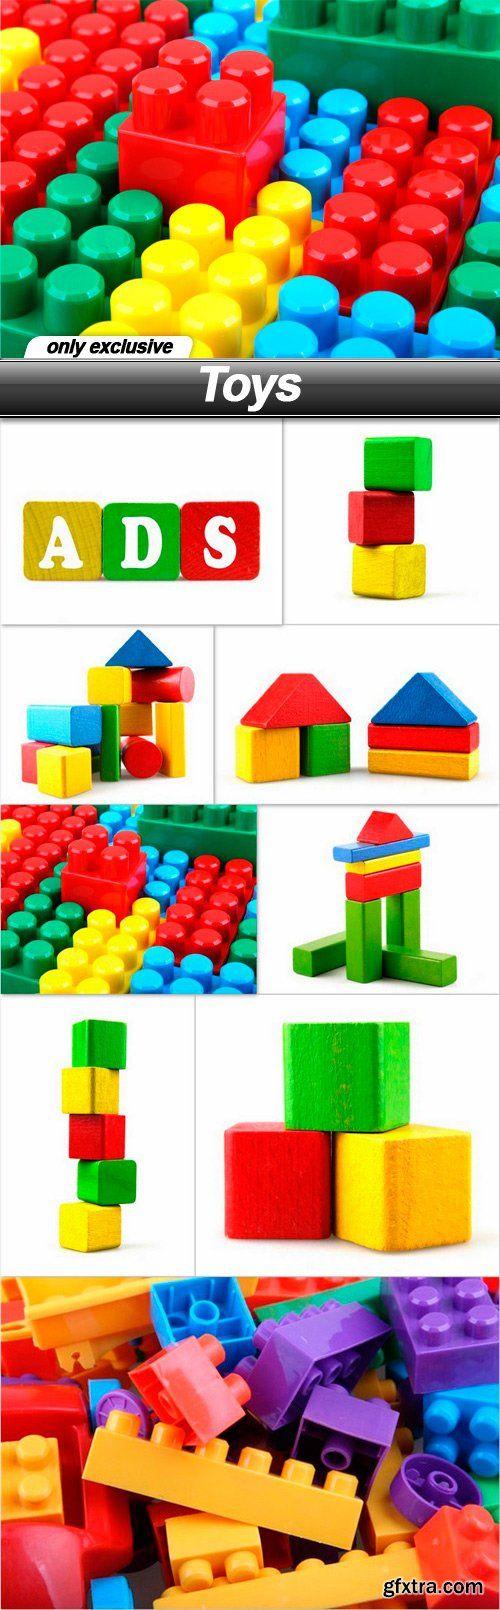 Toys - 10 UHQ JPEG